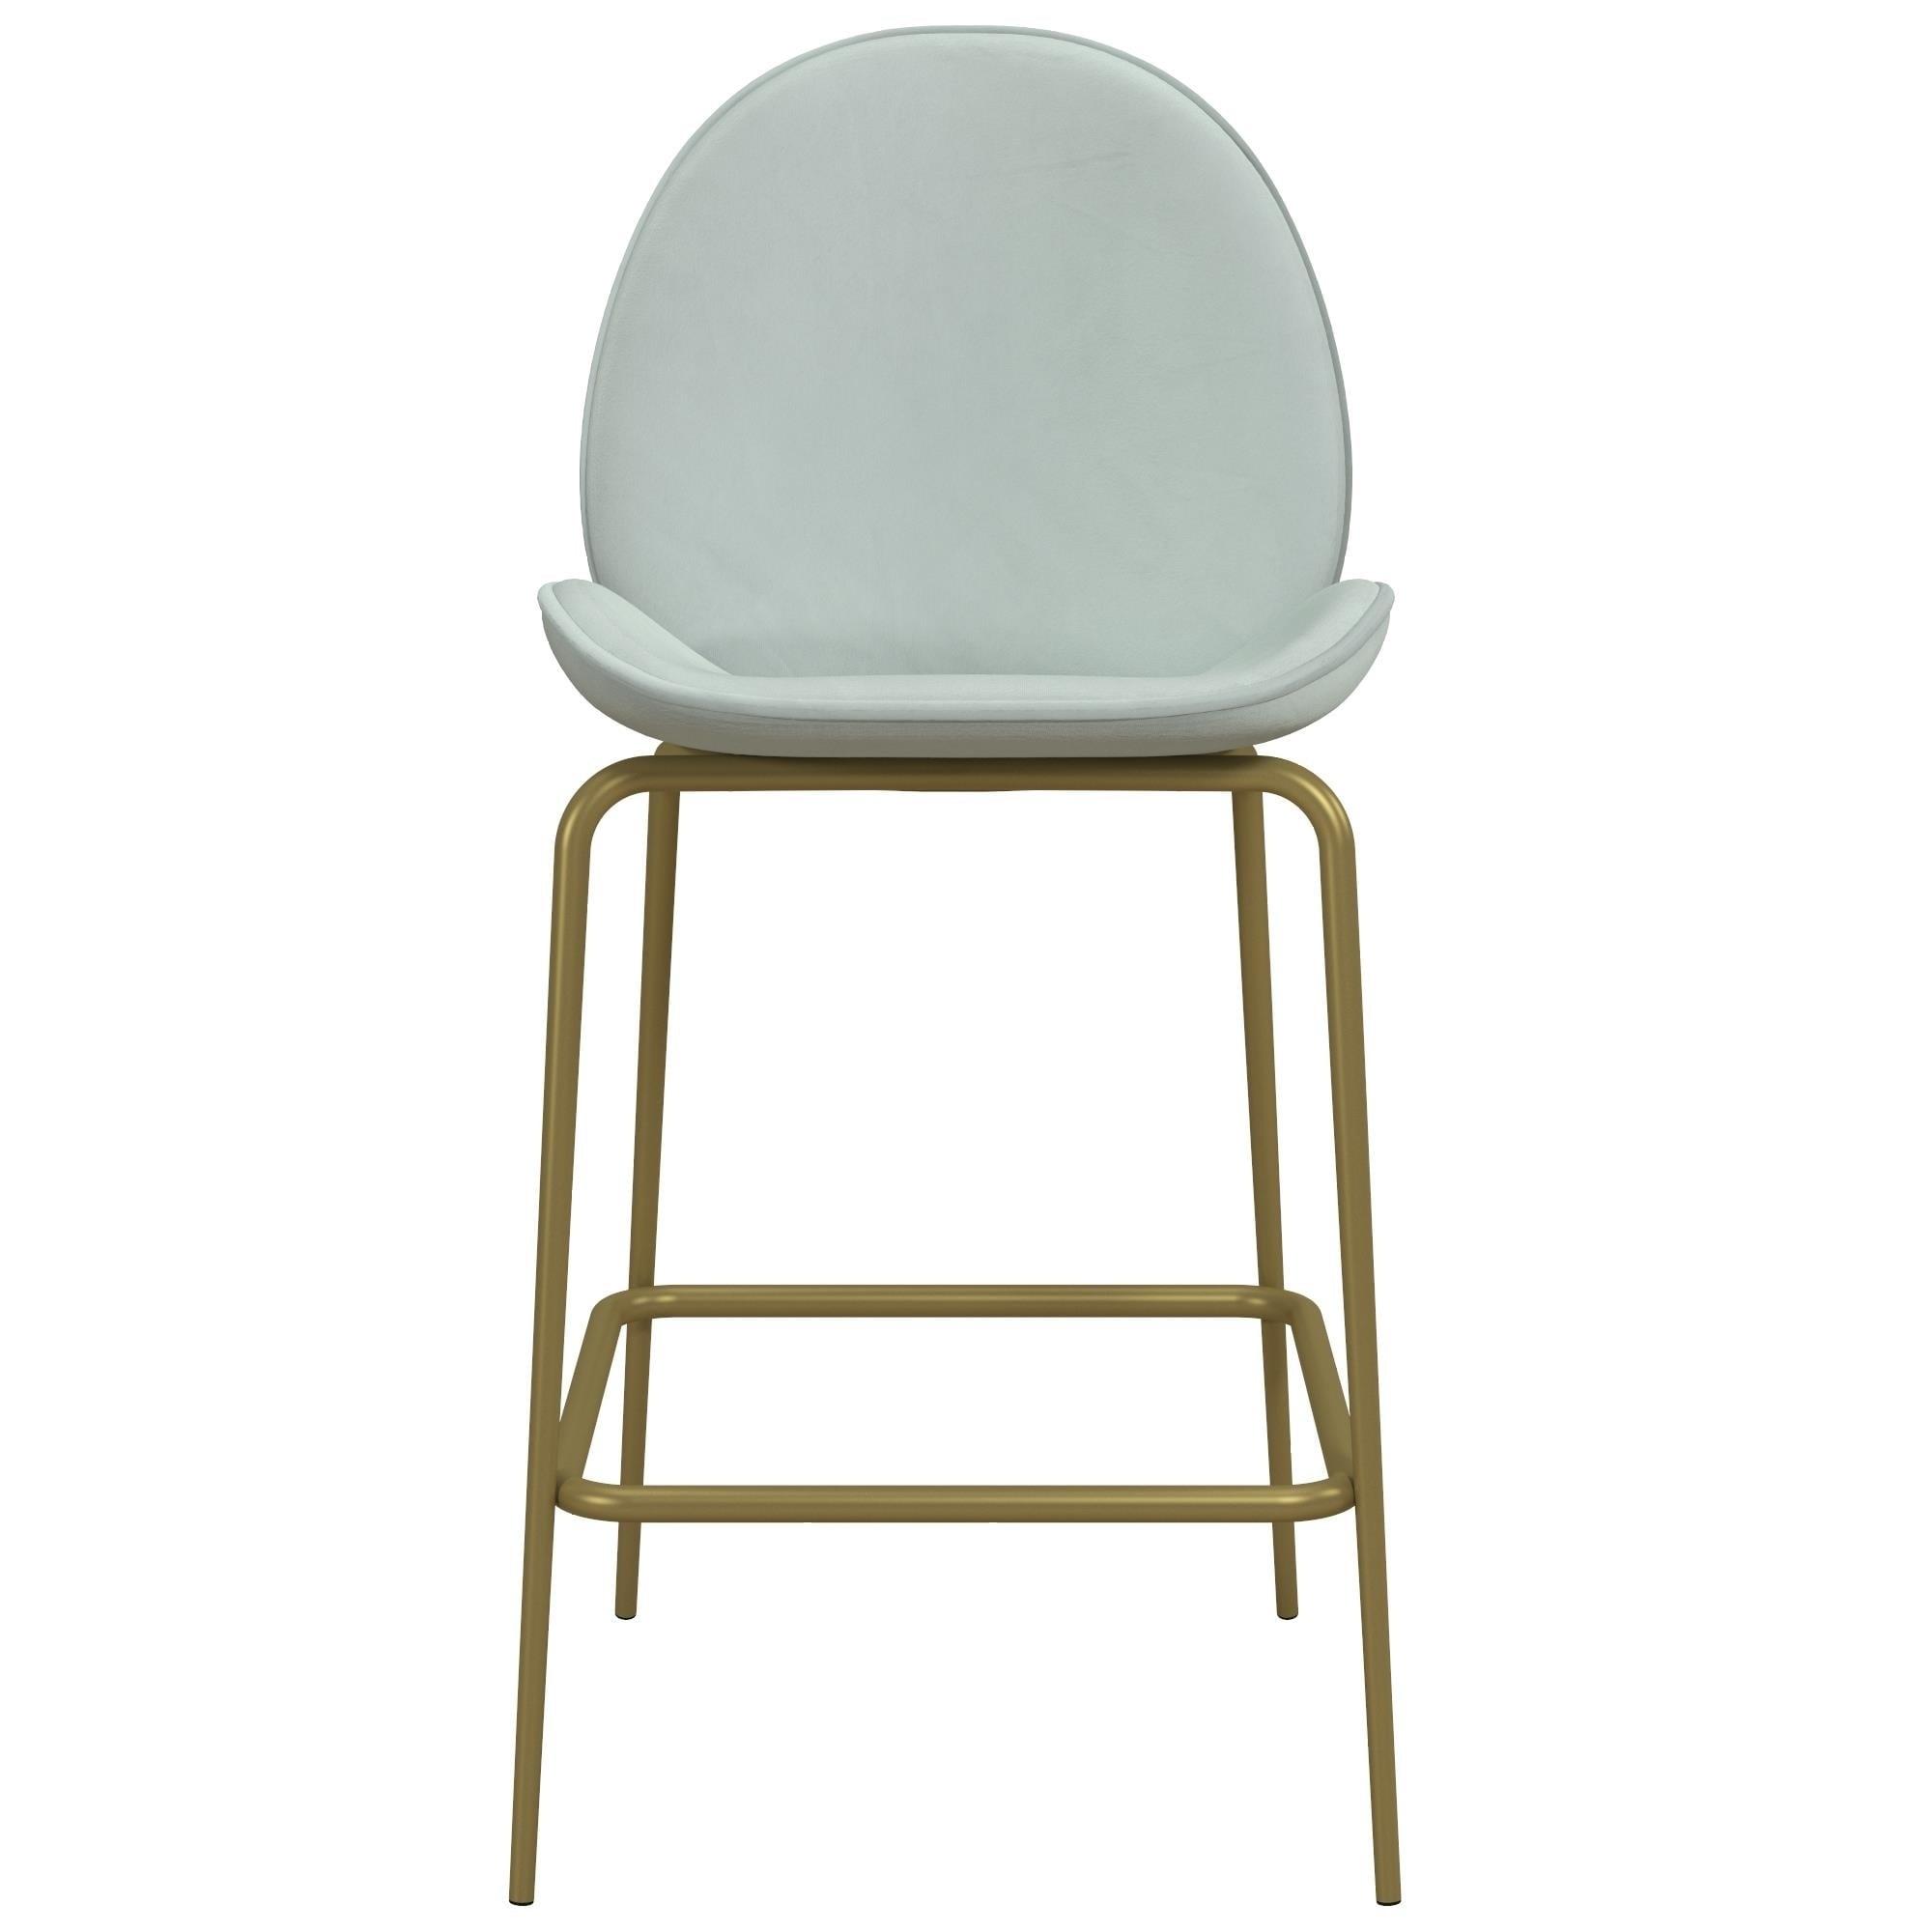 Fantastic Cosmoliving By Cosmopolitan Astor Upholstered Counter Stool Evergreenethics Interior Chair Design Evergreenethicsorg